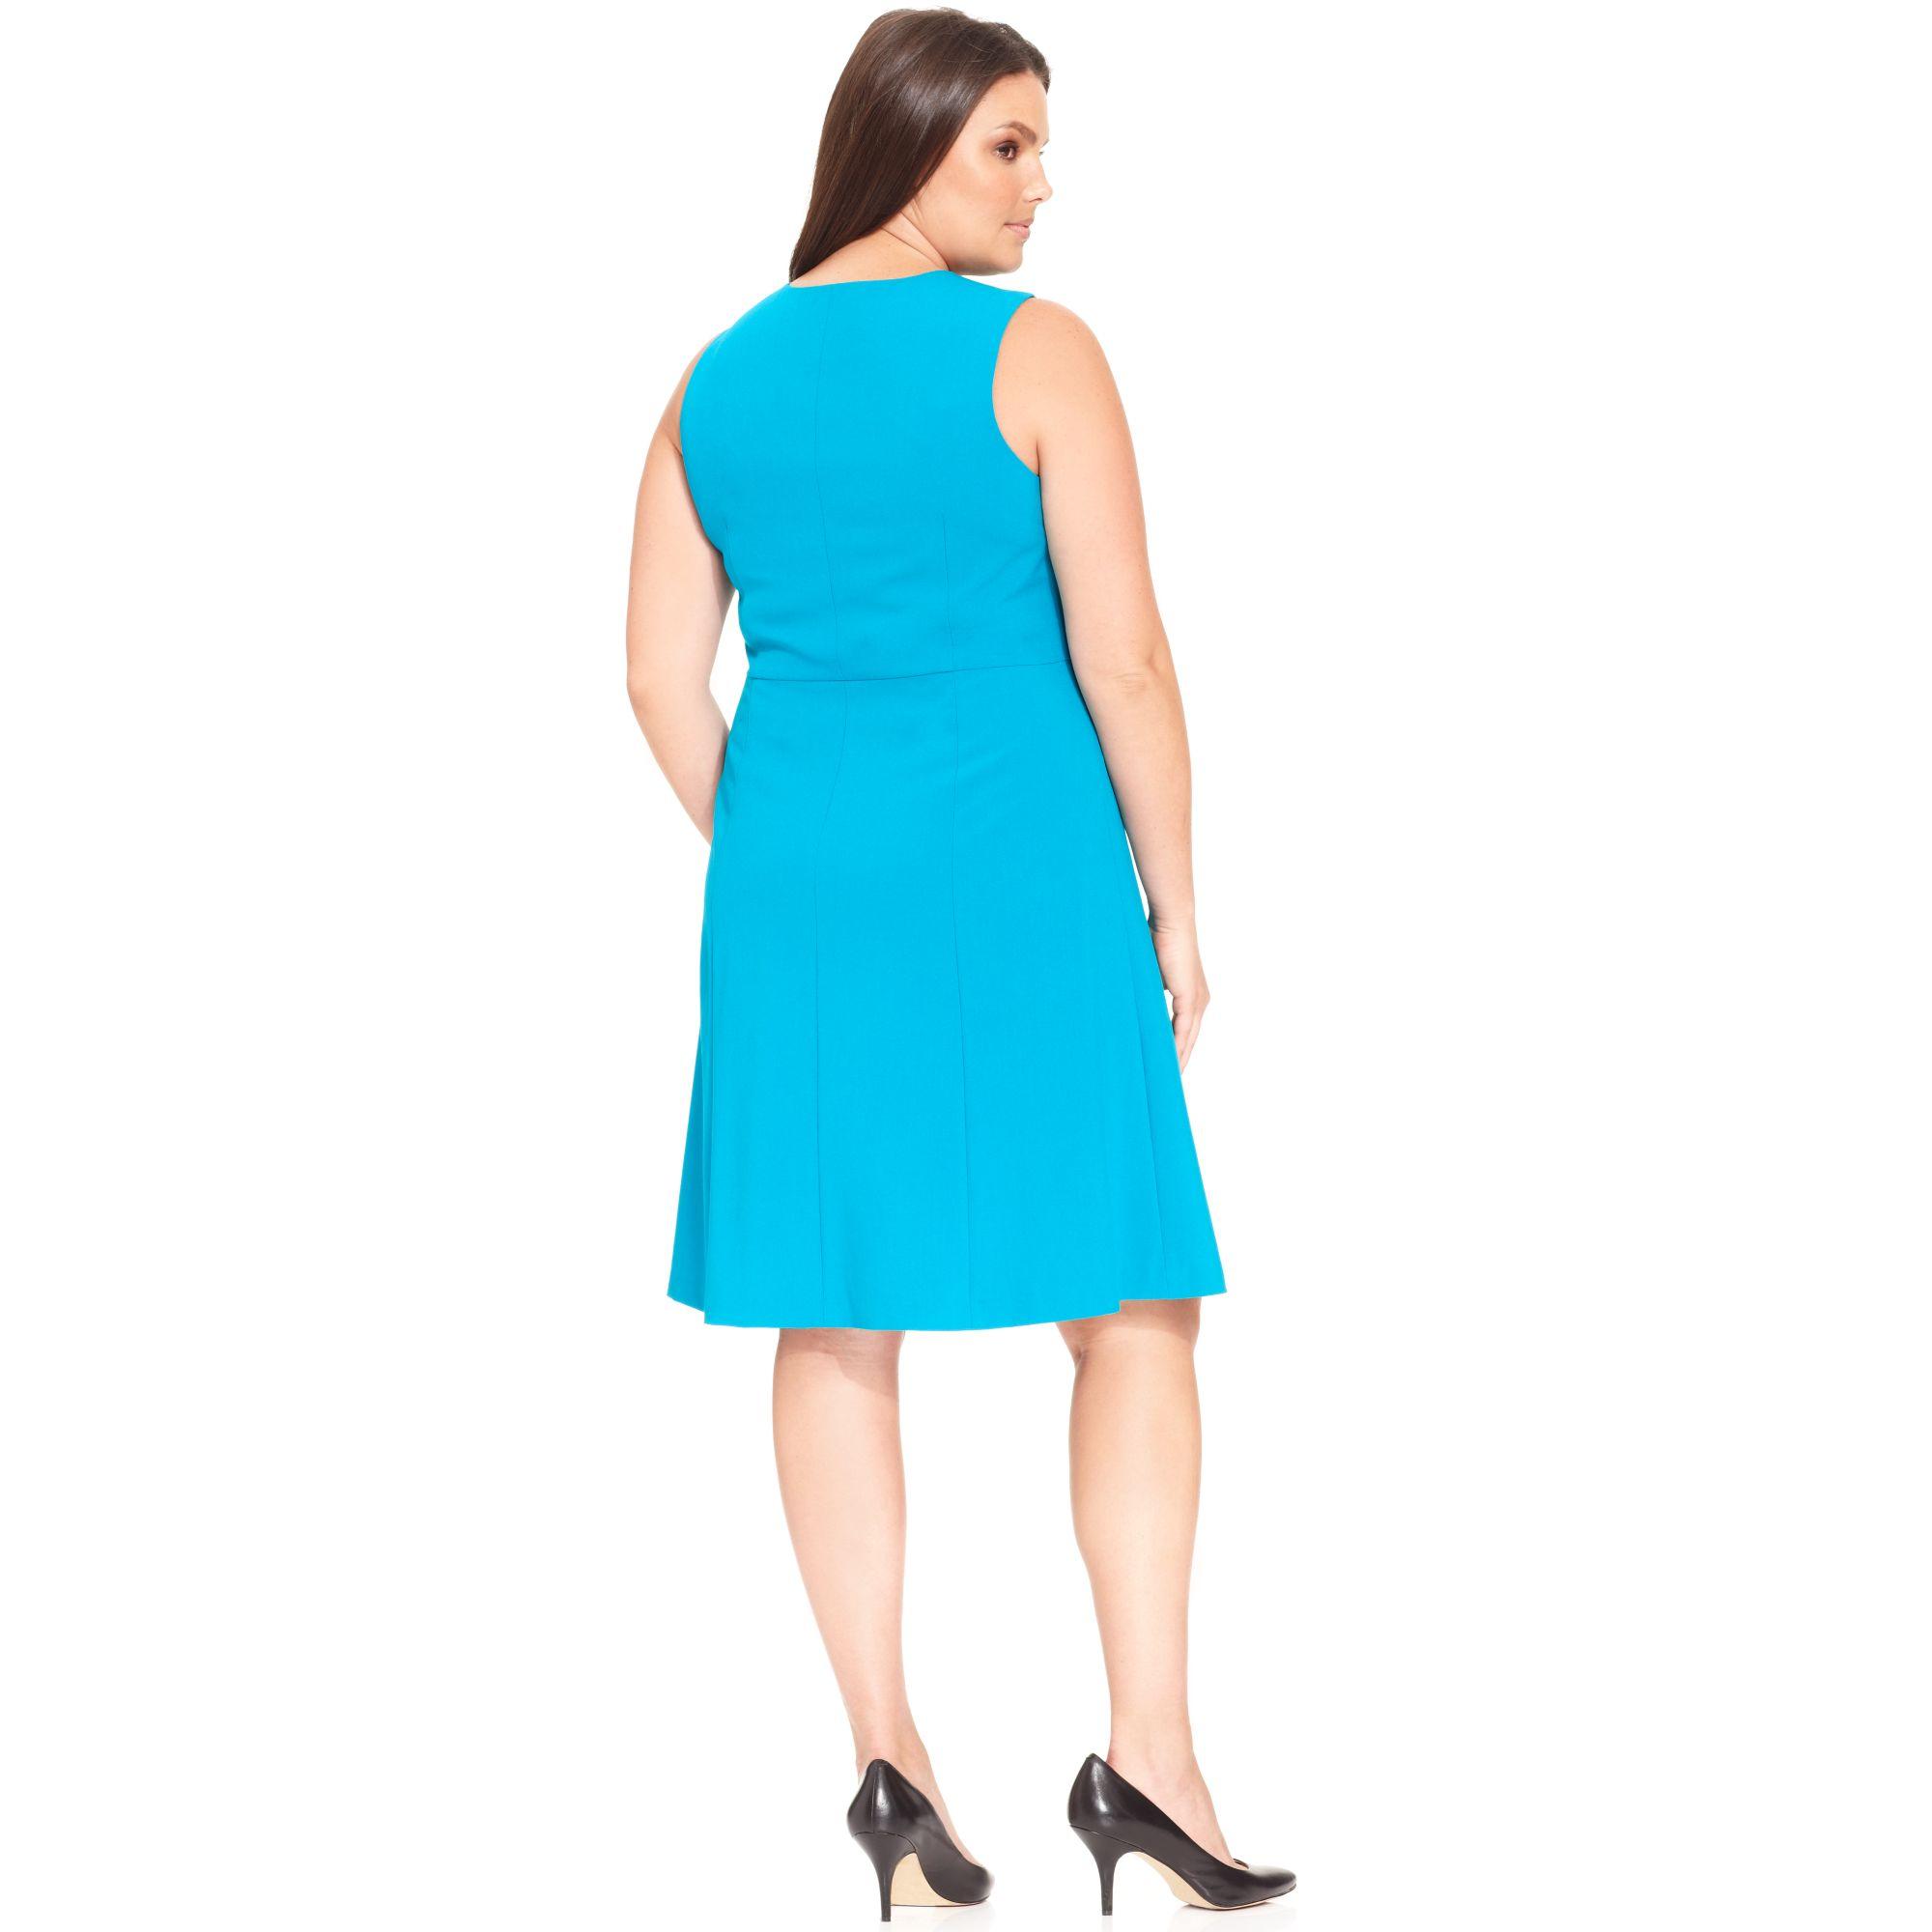 Lyst - Calvin Klein Plus Size Sleeveless Aline Dress in Blue